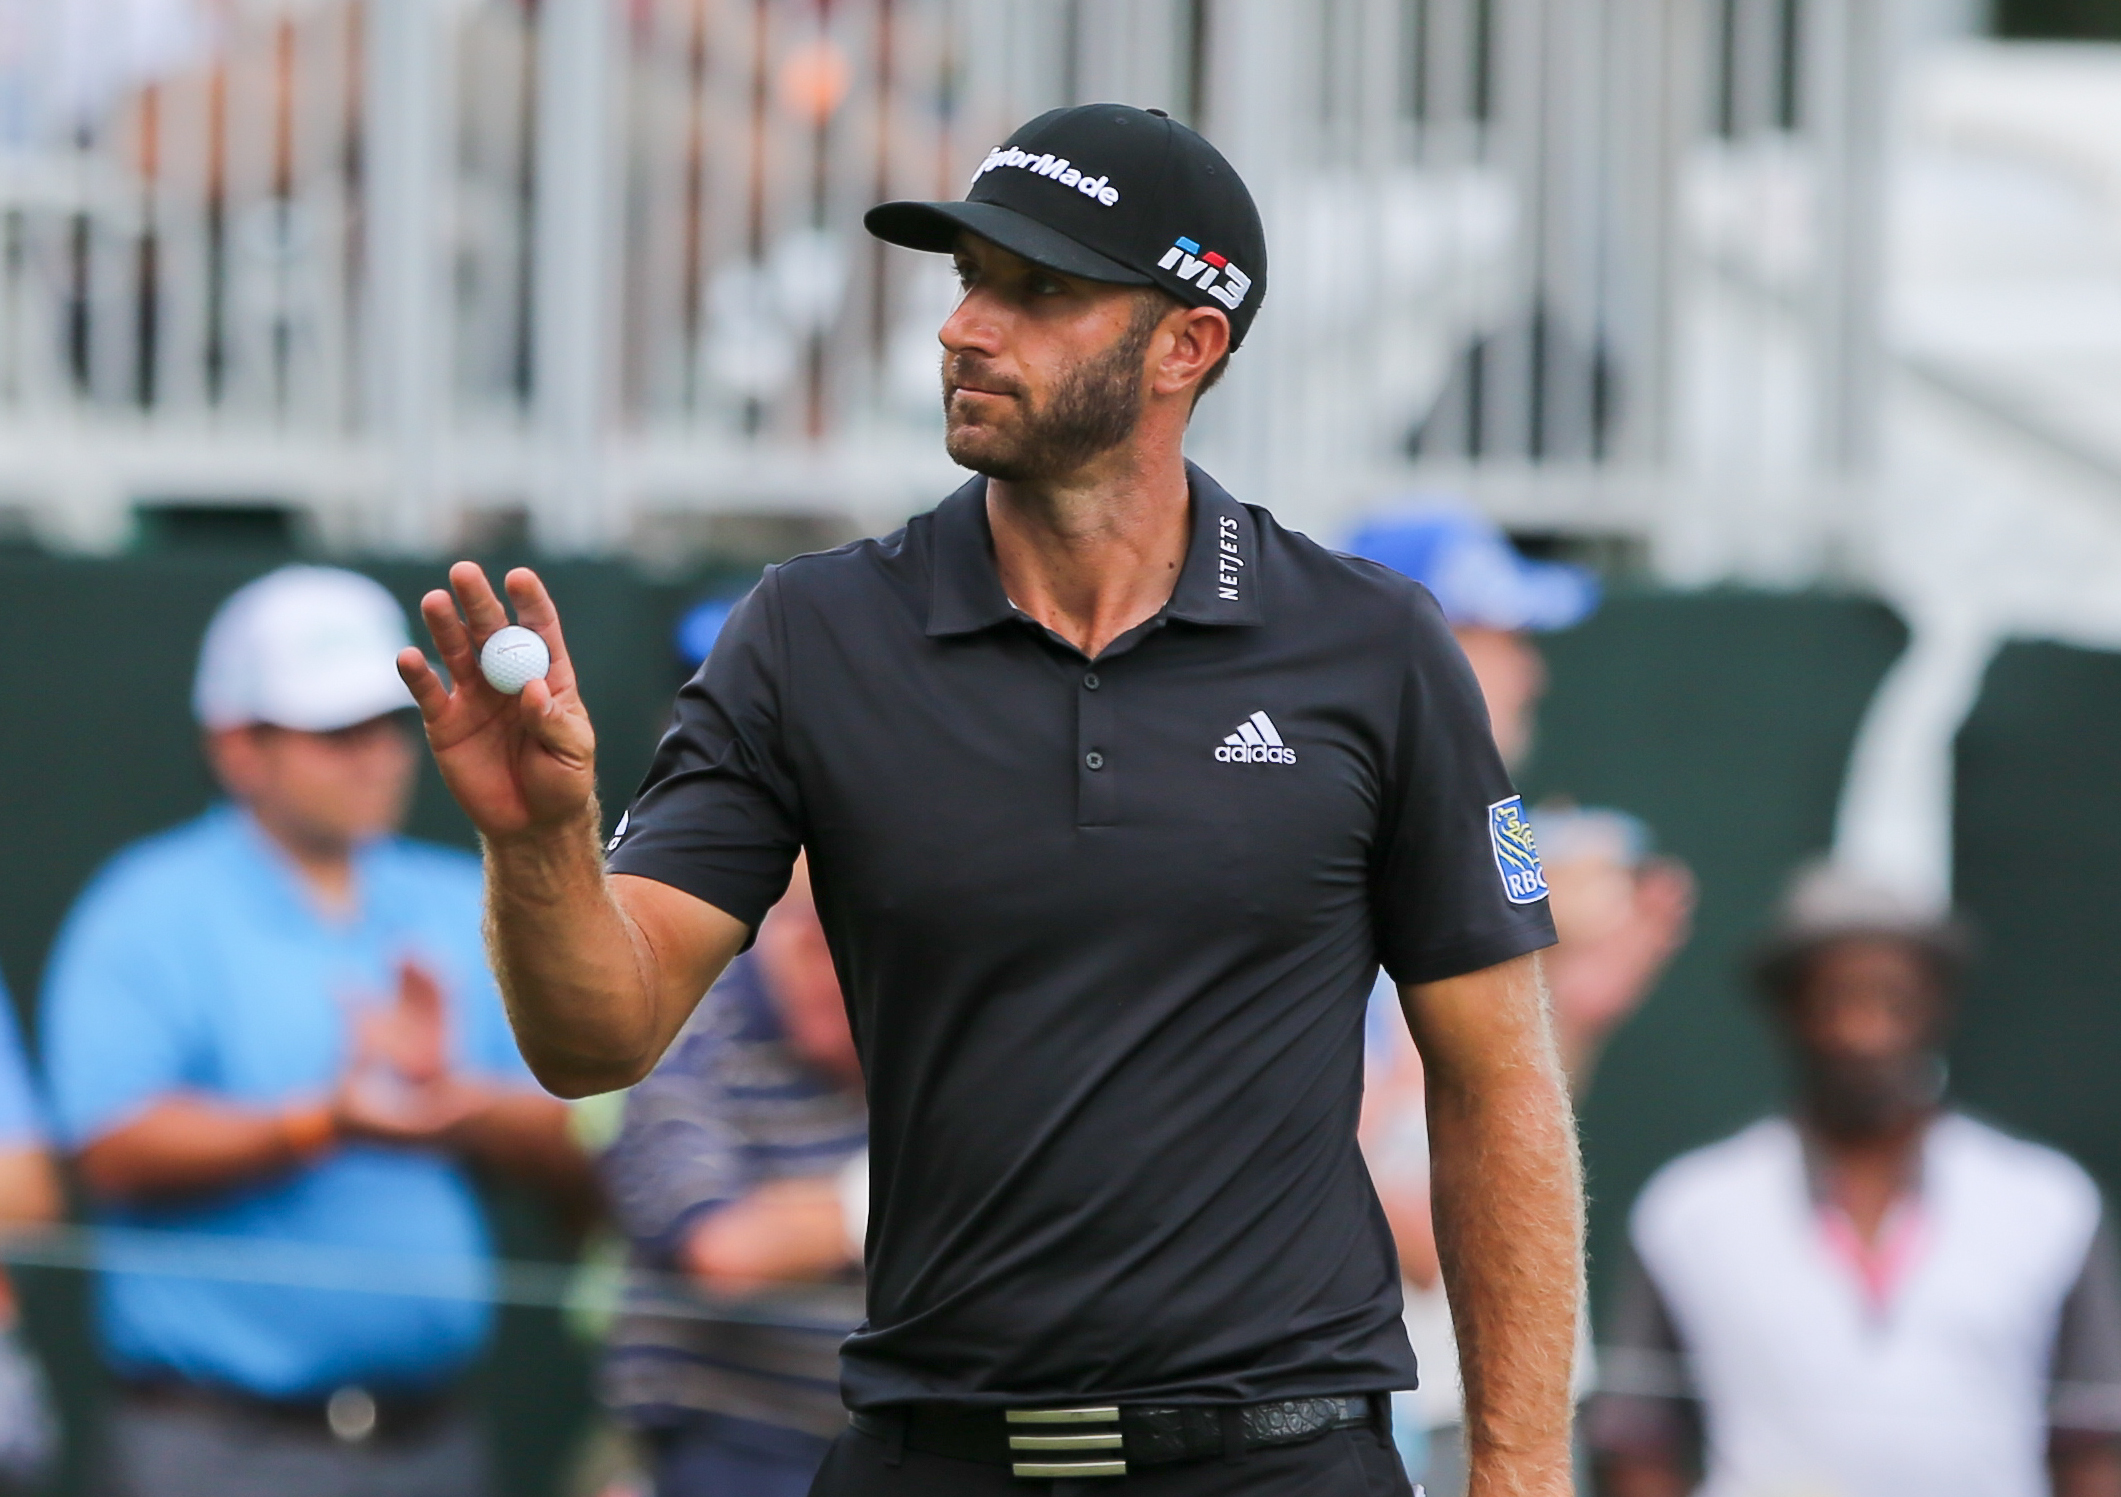 Golf - Tour européen - Saudi International: Dustin Johnson s'impose, Alexander Levy 5e